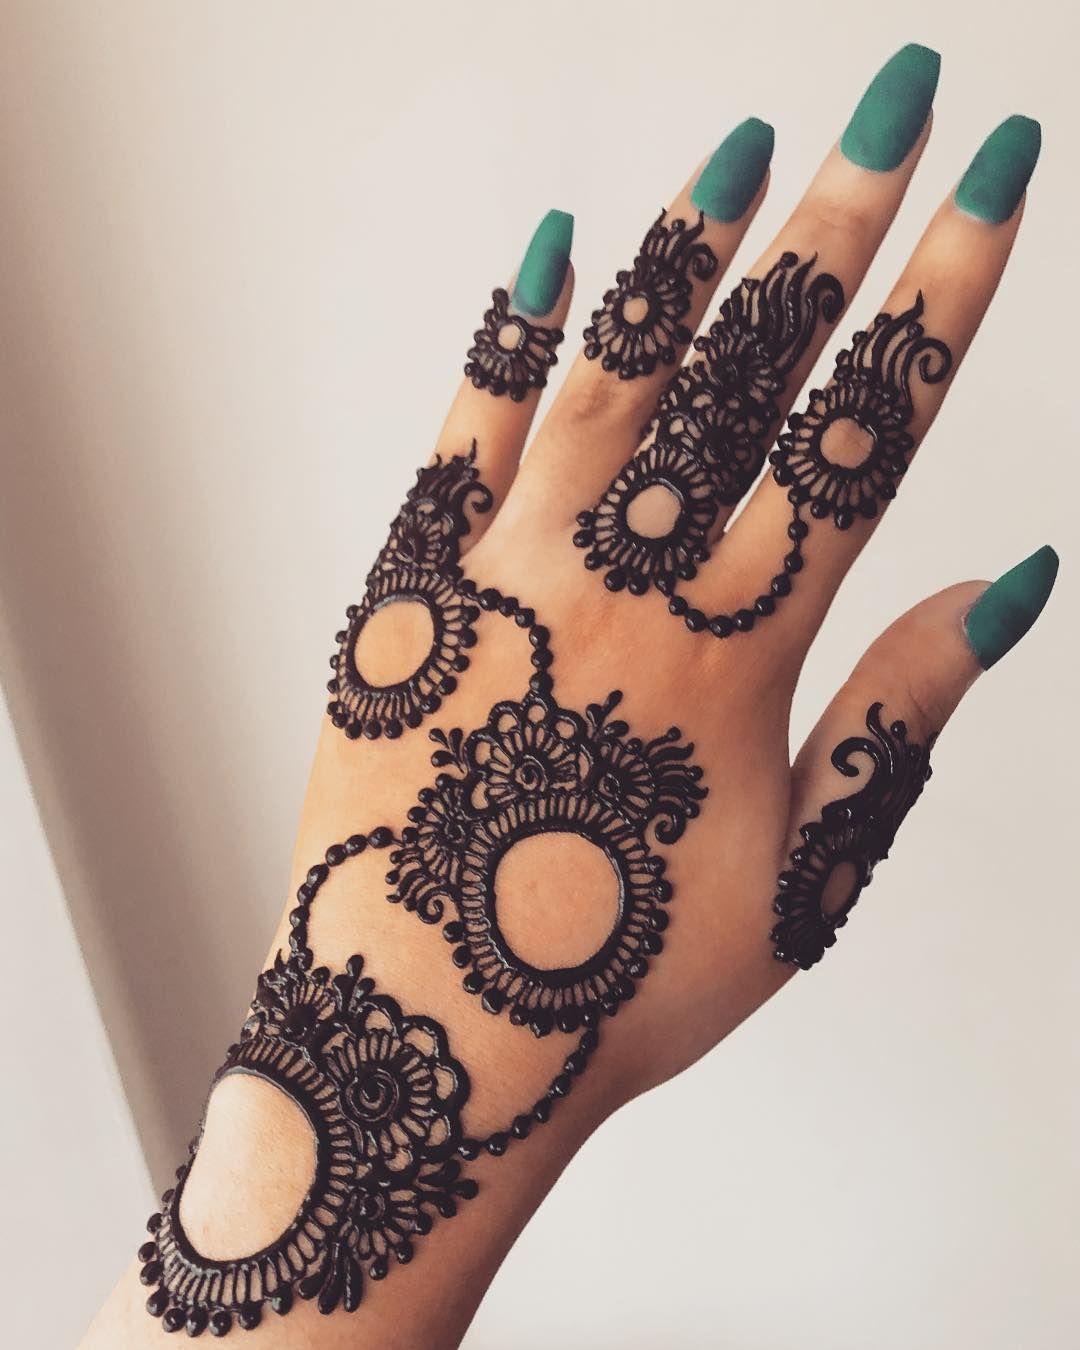 Circle Mehndi Designs By 𝙼𝚊𝚛𝚒𝚊𝚗𝚊 On T